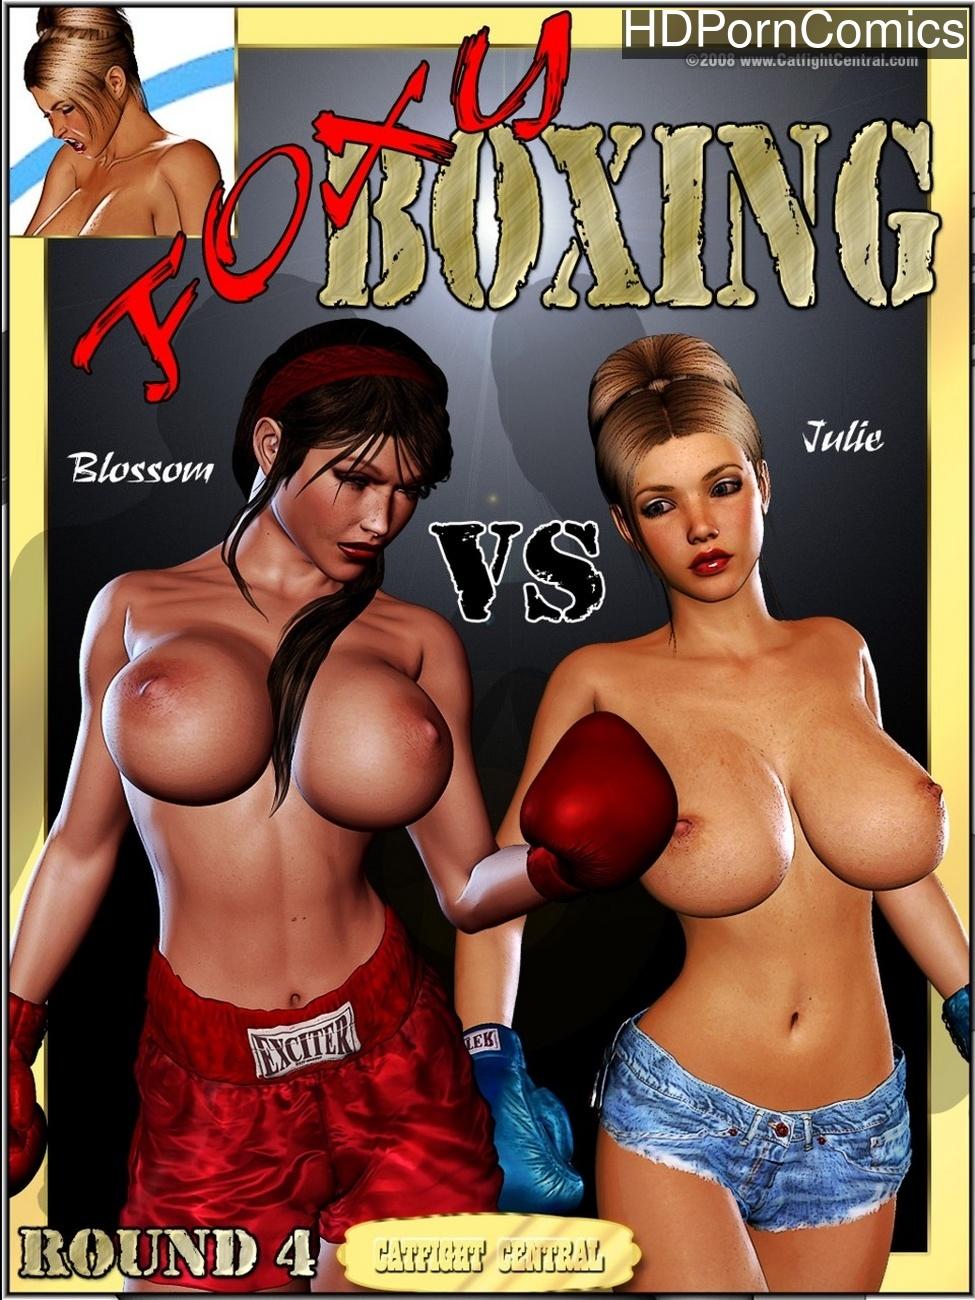 Foxy Boxing 1 – Blossom Vs Julie – Round 4 comic porn